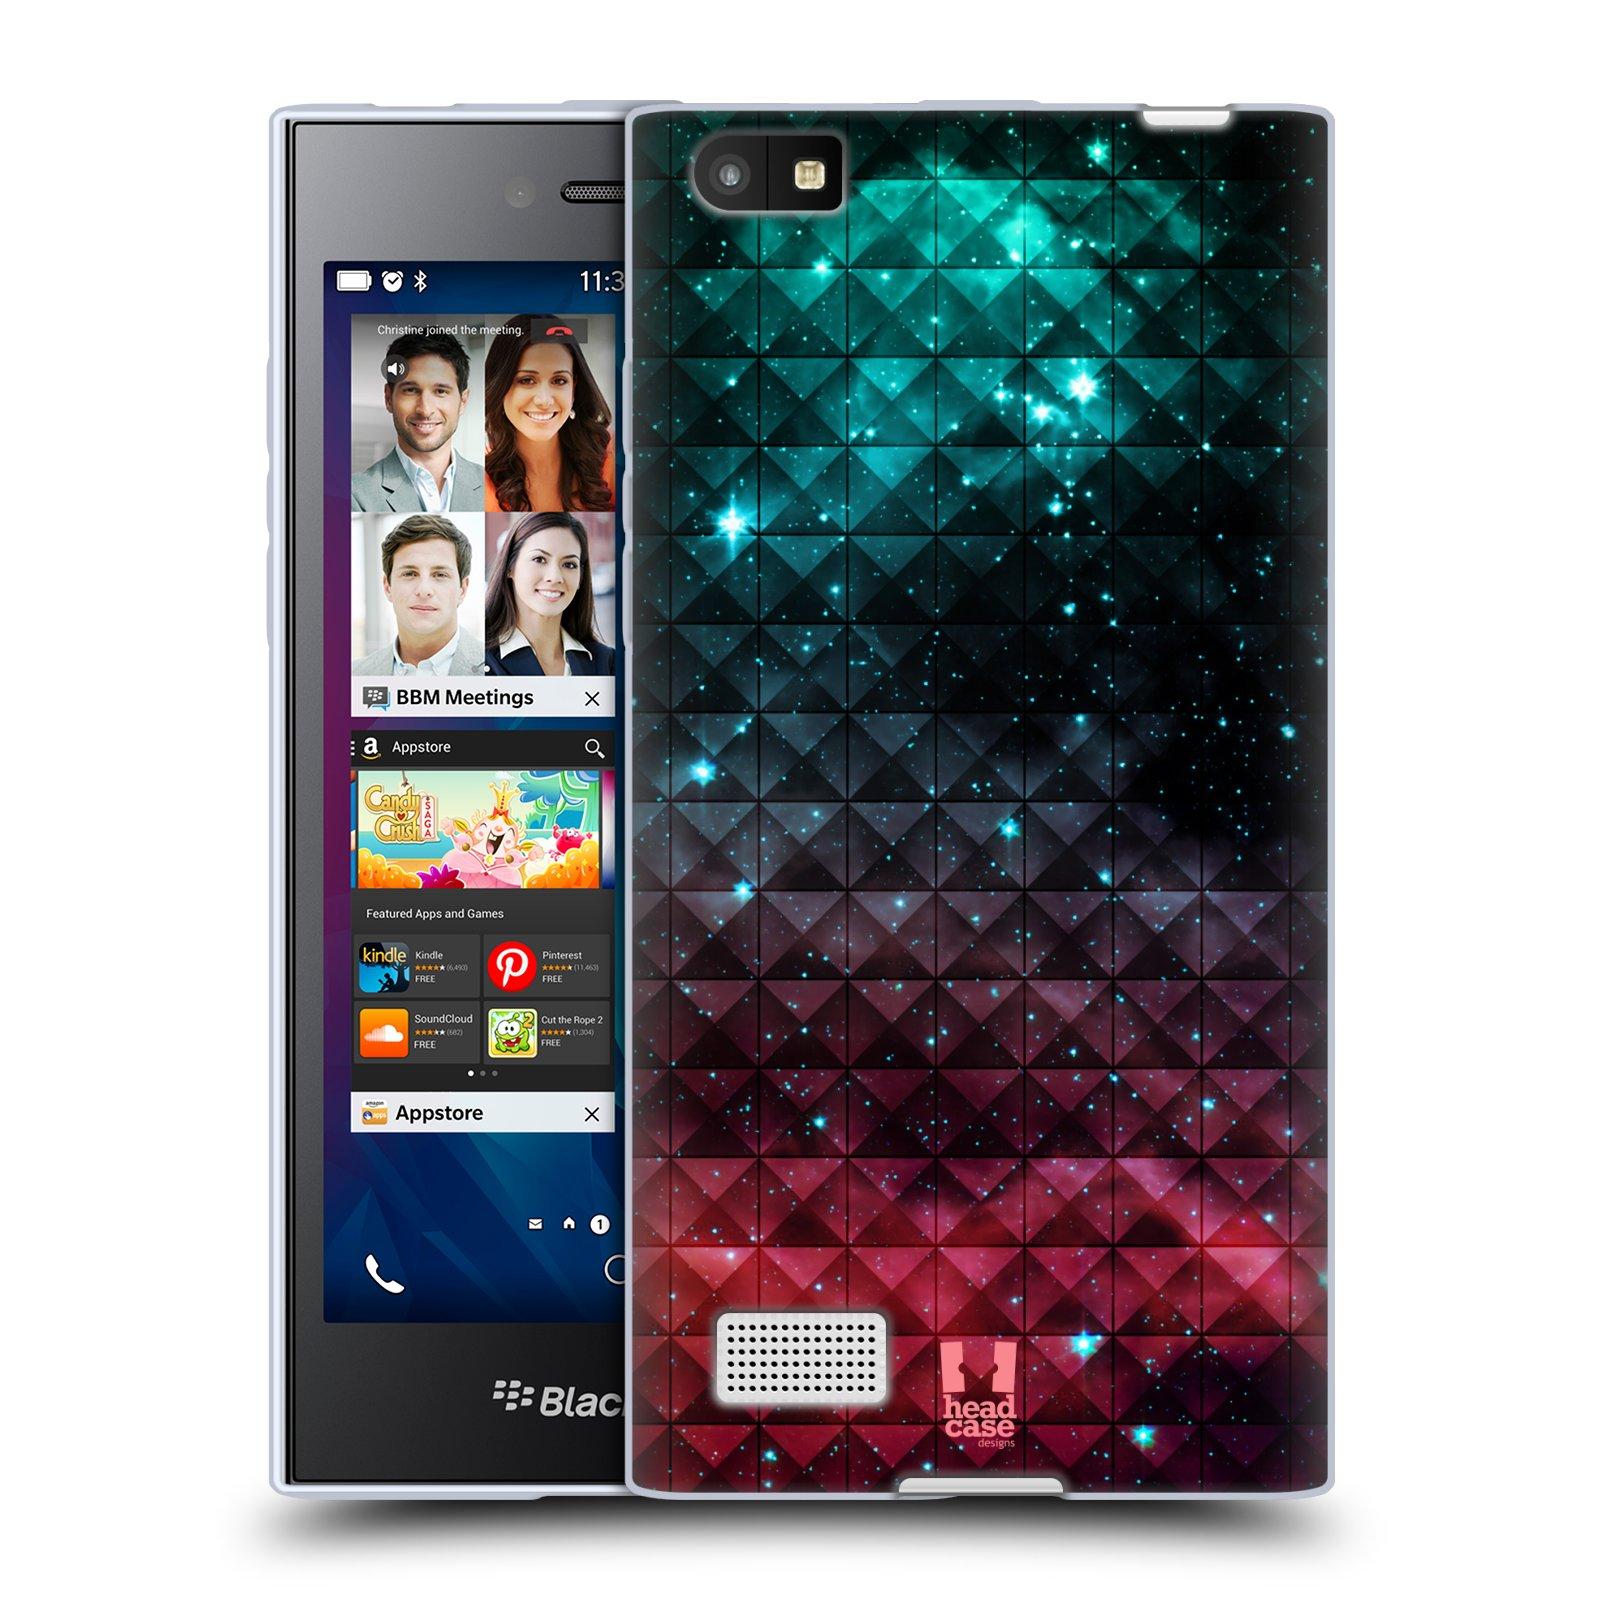 Silikonové pouzdro na mobil Blackberry Leap HEAD CASE OMBRE SPARKLE